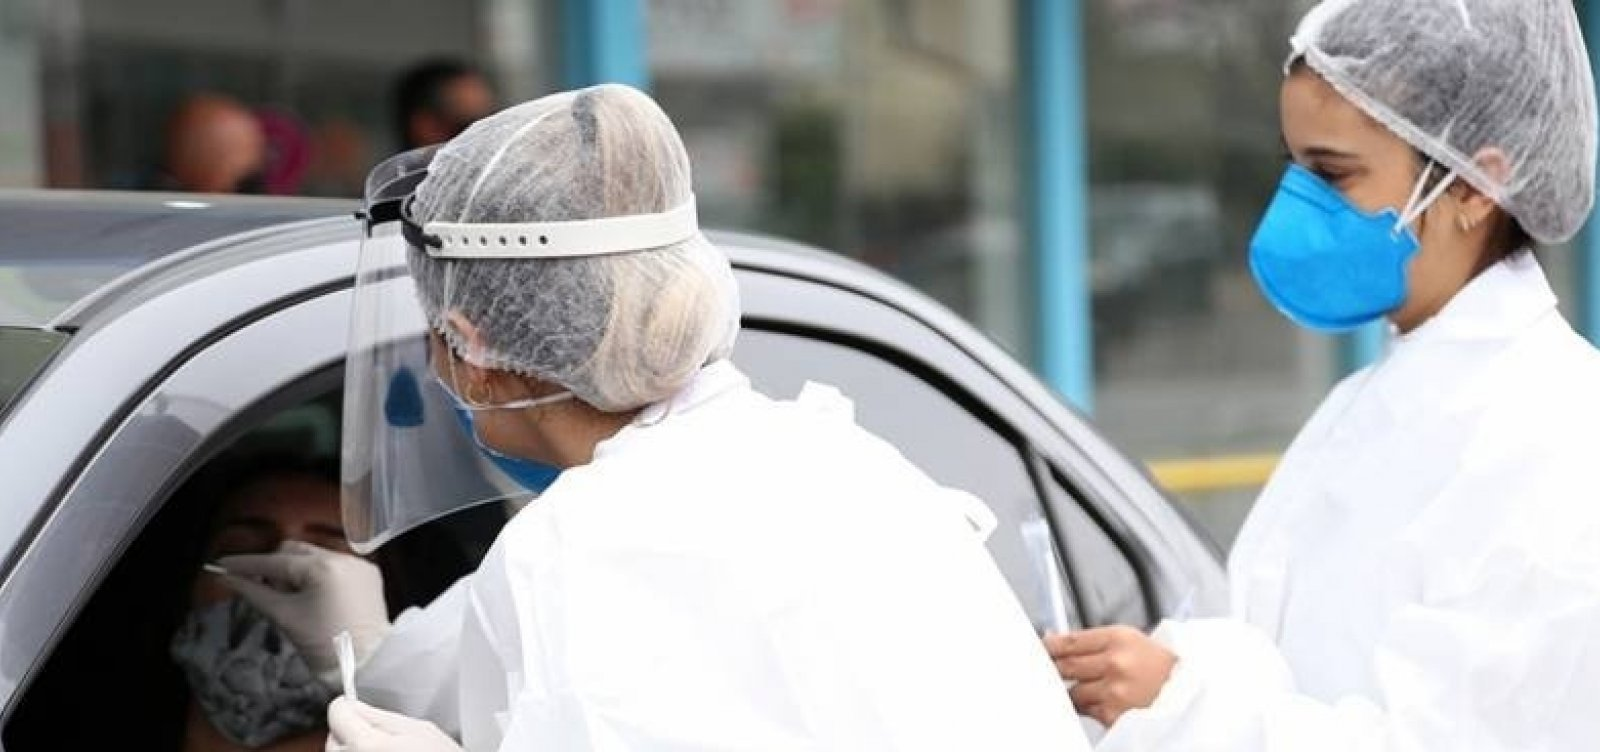 Brasil tem 221.849 mortes por Covid-19, diz consórcio de imprensa